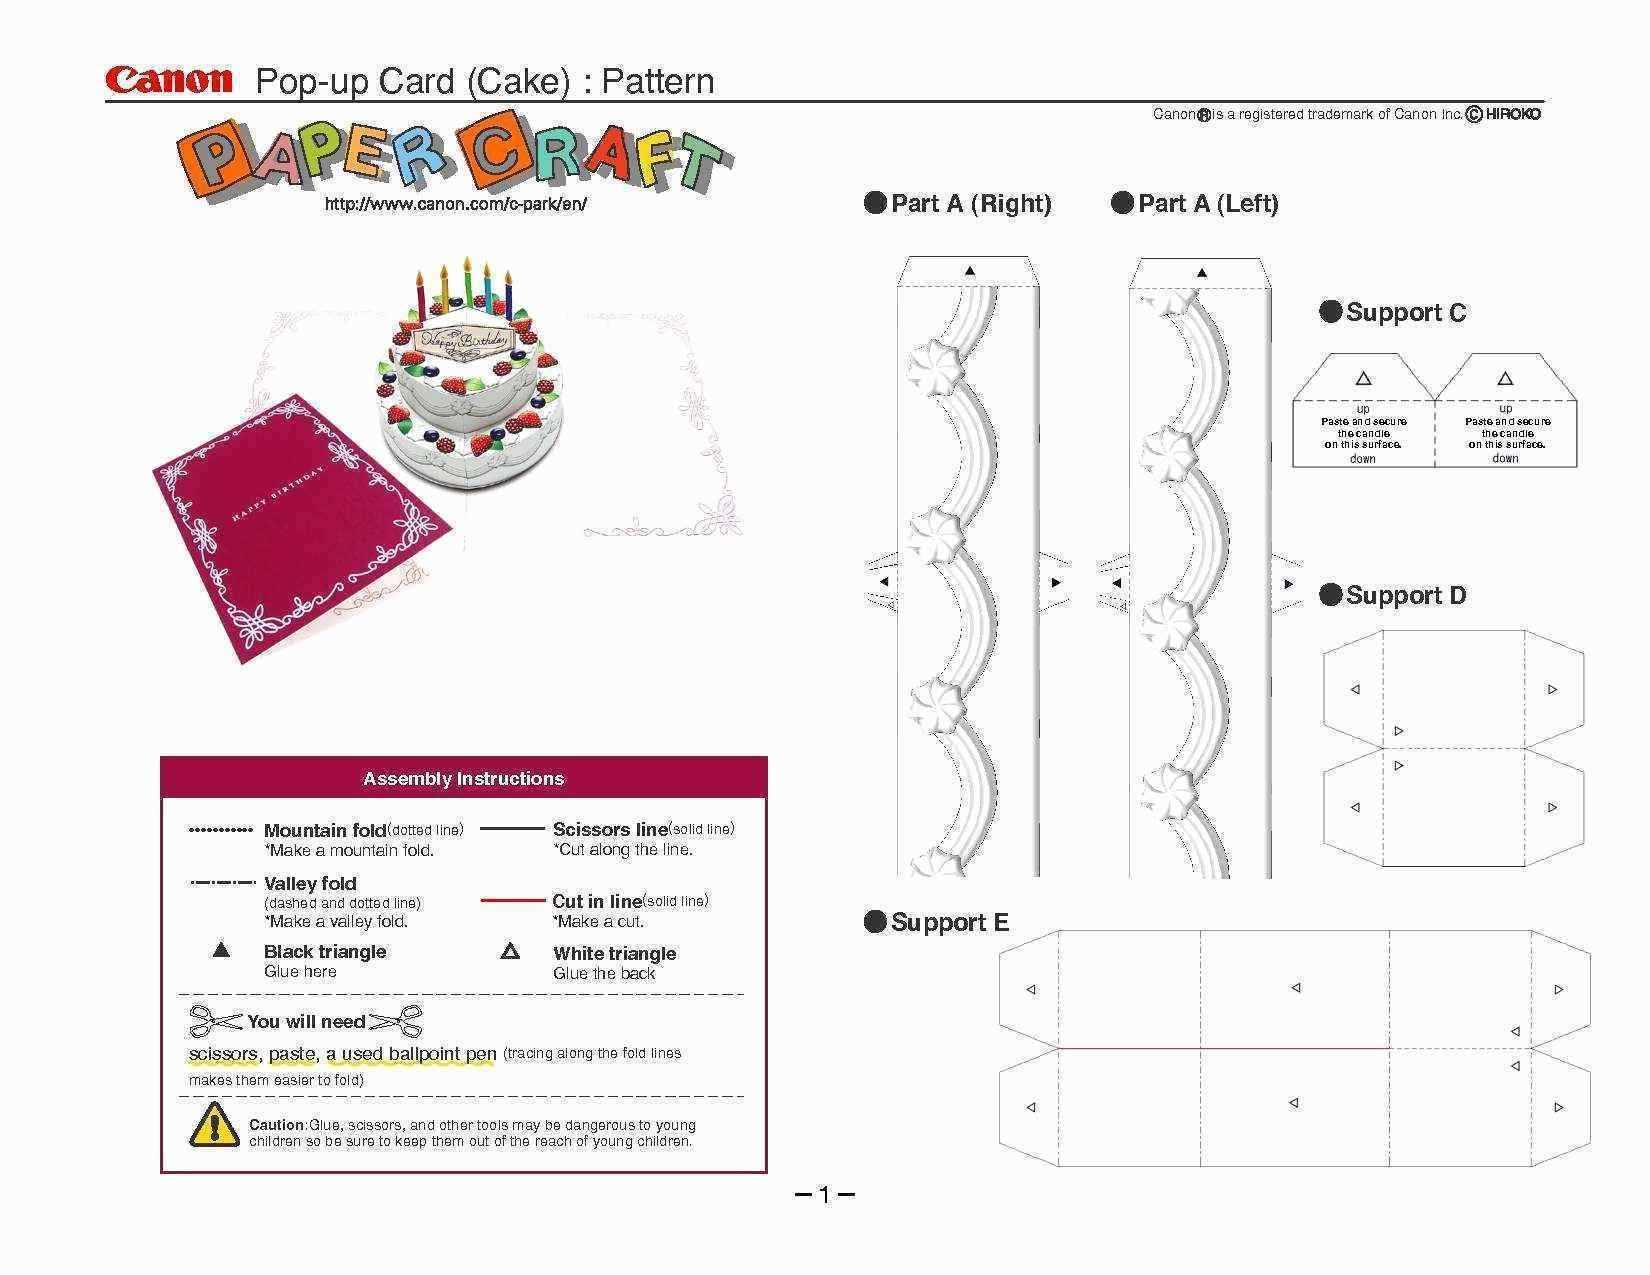 035 Pop Up Cards Templates Canon Papercraft Card Box With Regard To Pop Up Card Box Template